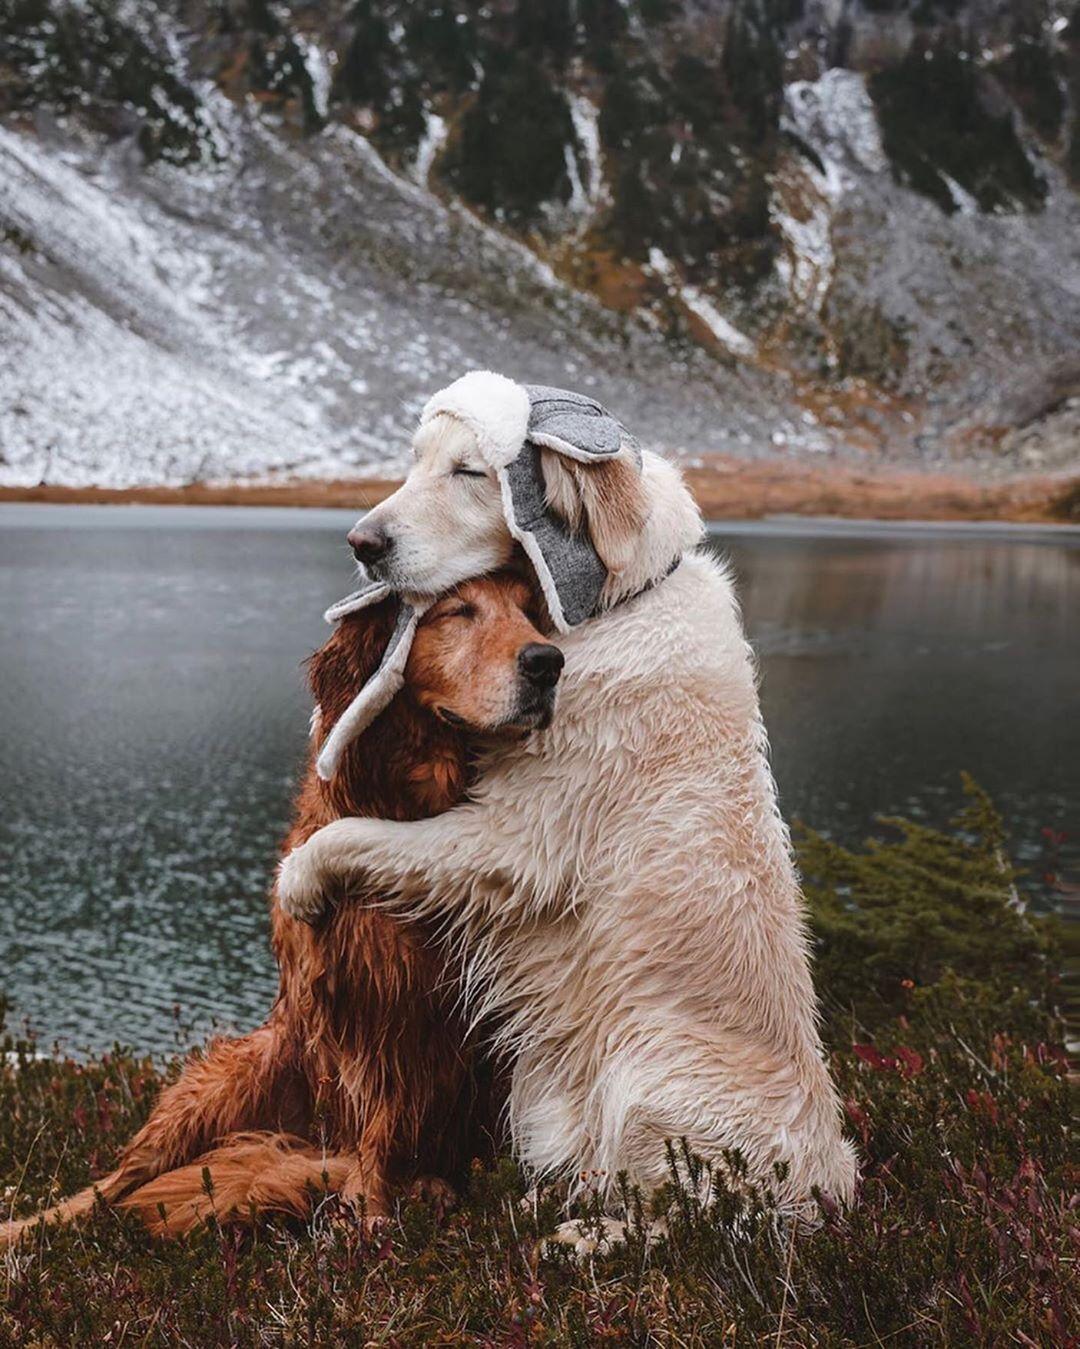 Best friends forever! Tag your best friend 🥰🥰🥰 📸 by: @wat.ki https://t.co/fb0C4OzCcB